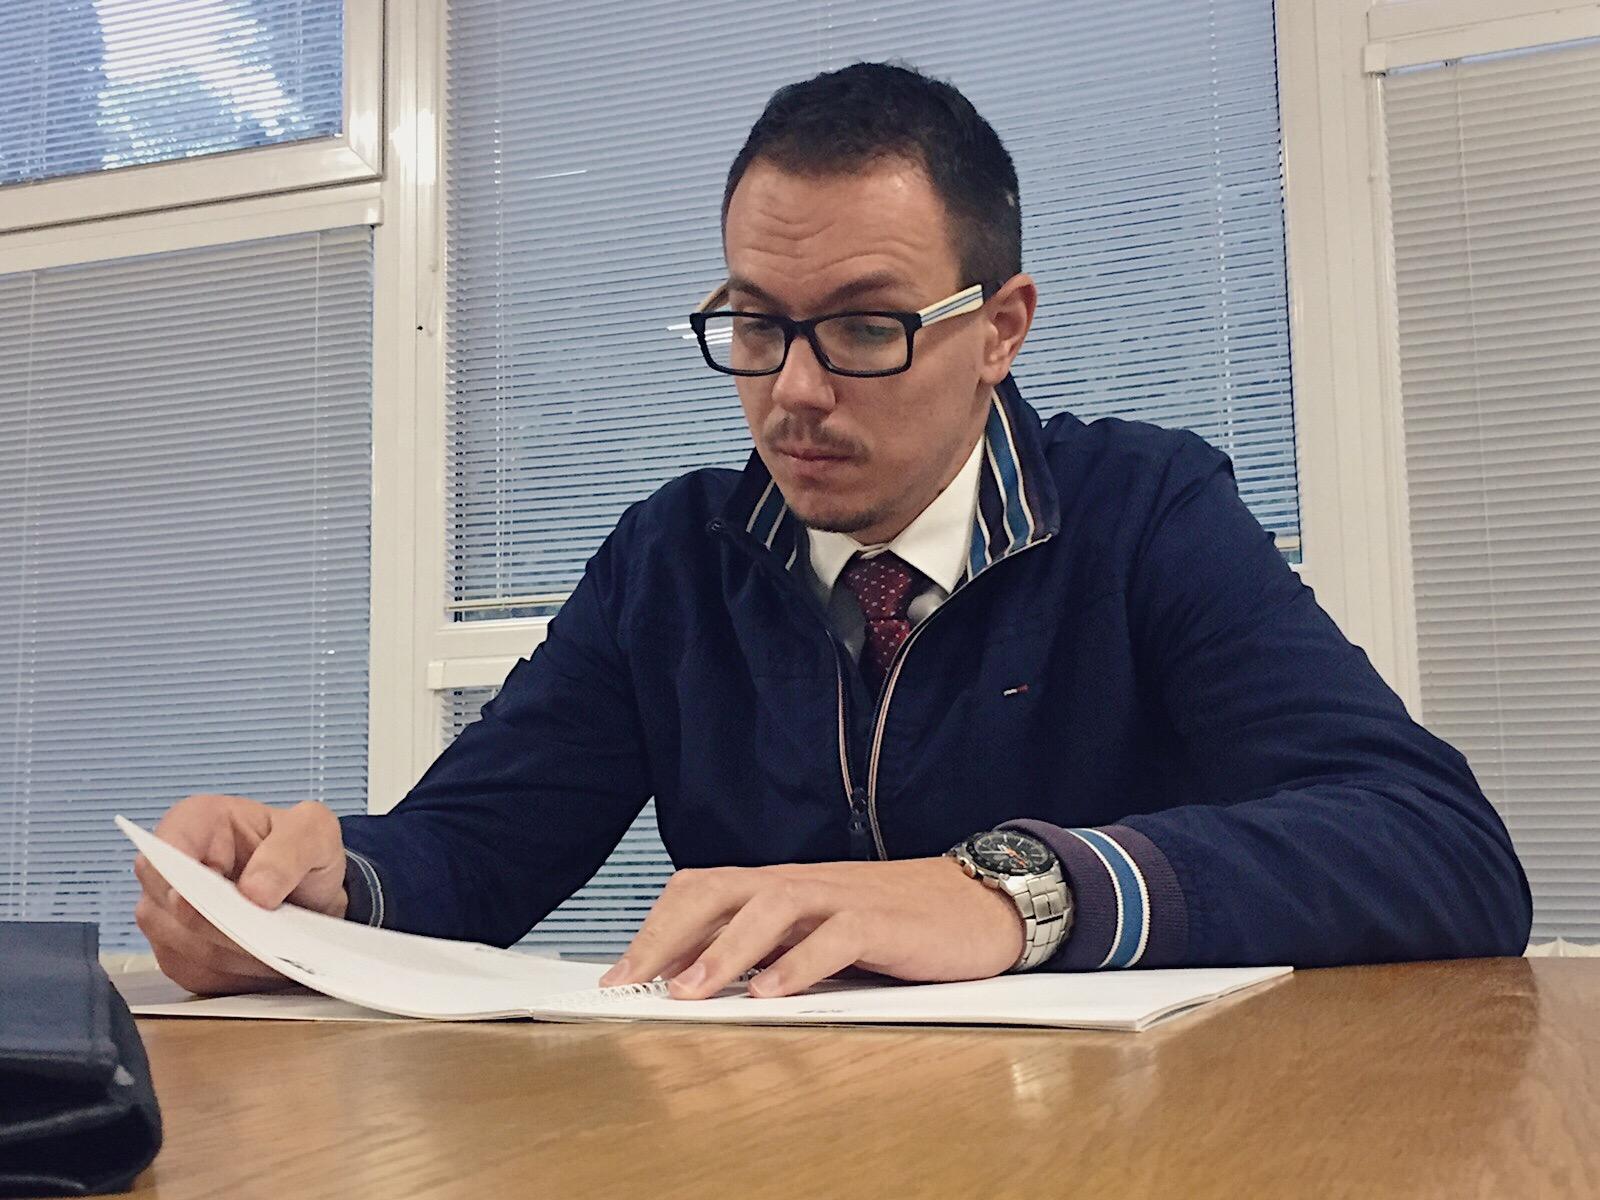 Michal Boťanský blog článo